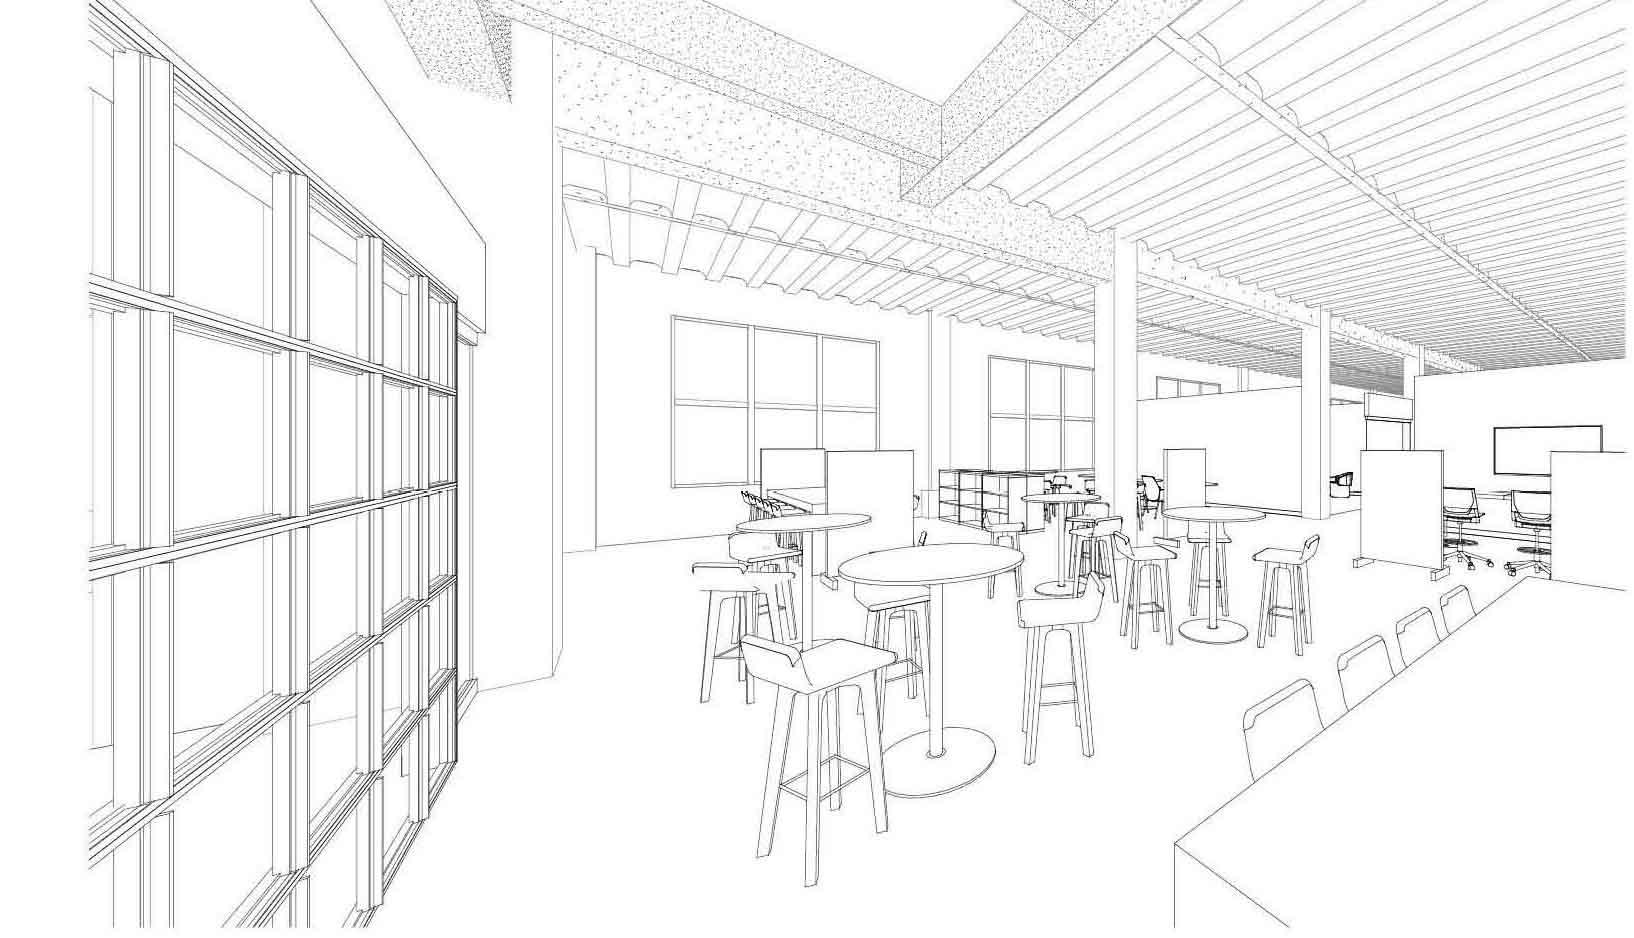 Sketch of Schaefer's lounge area